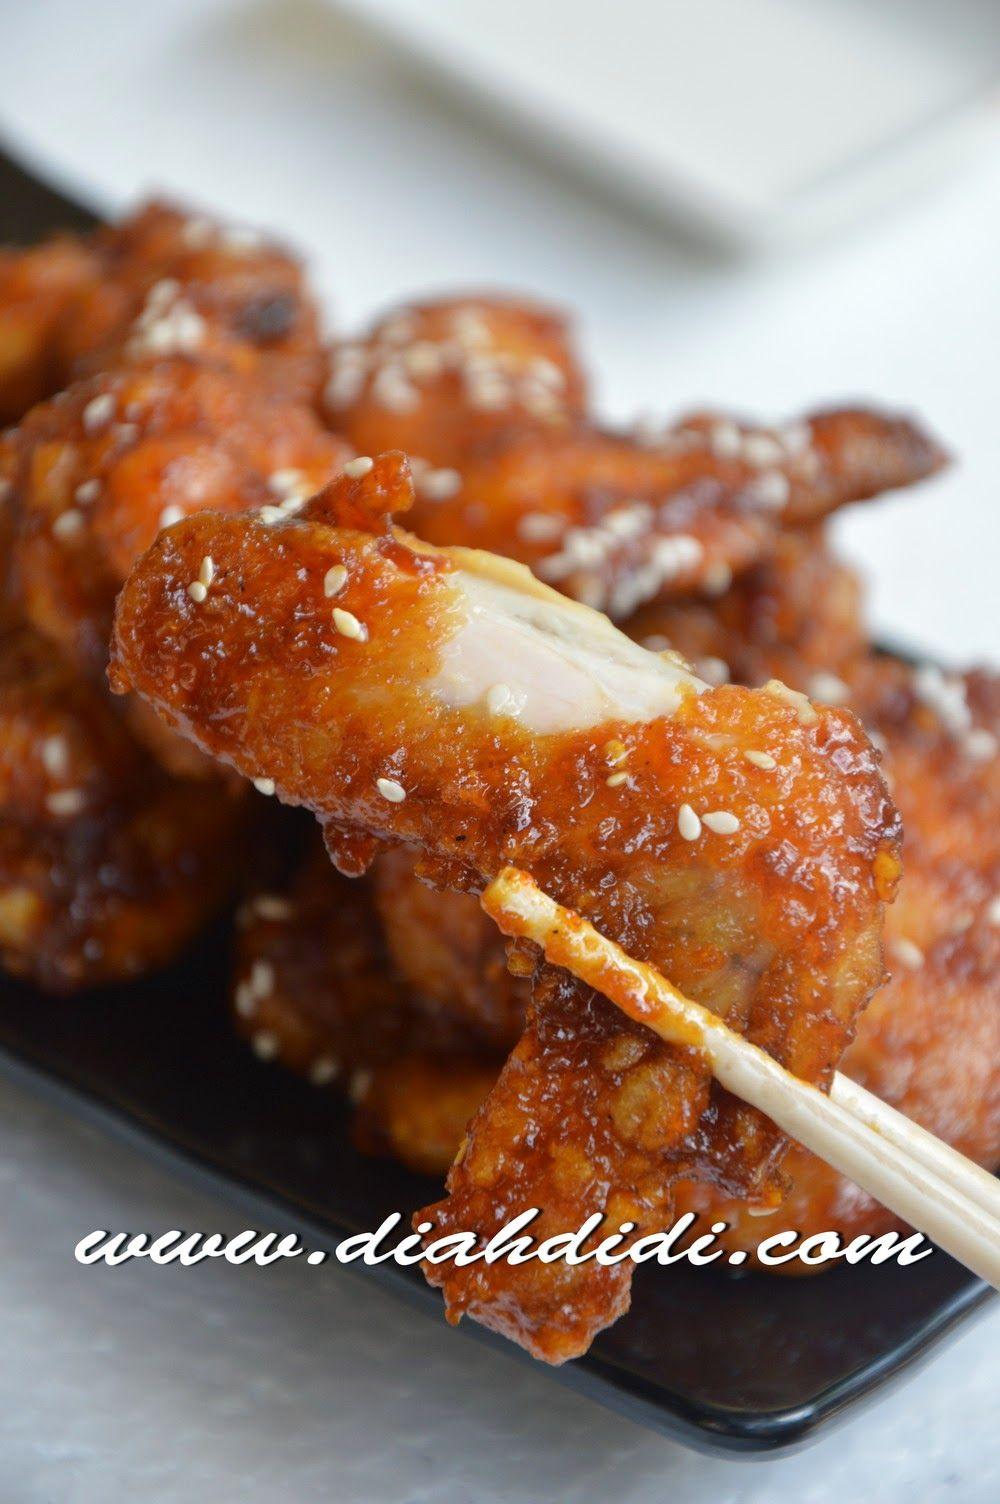 Resep Resep Sweet Spicy Korean Fried Chicken Ayam Goreng Pedas Ala Korea Oleh Mary Resep Resep Masakan Ayam Goreng Ayam Goreng Korea